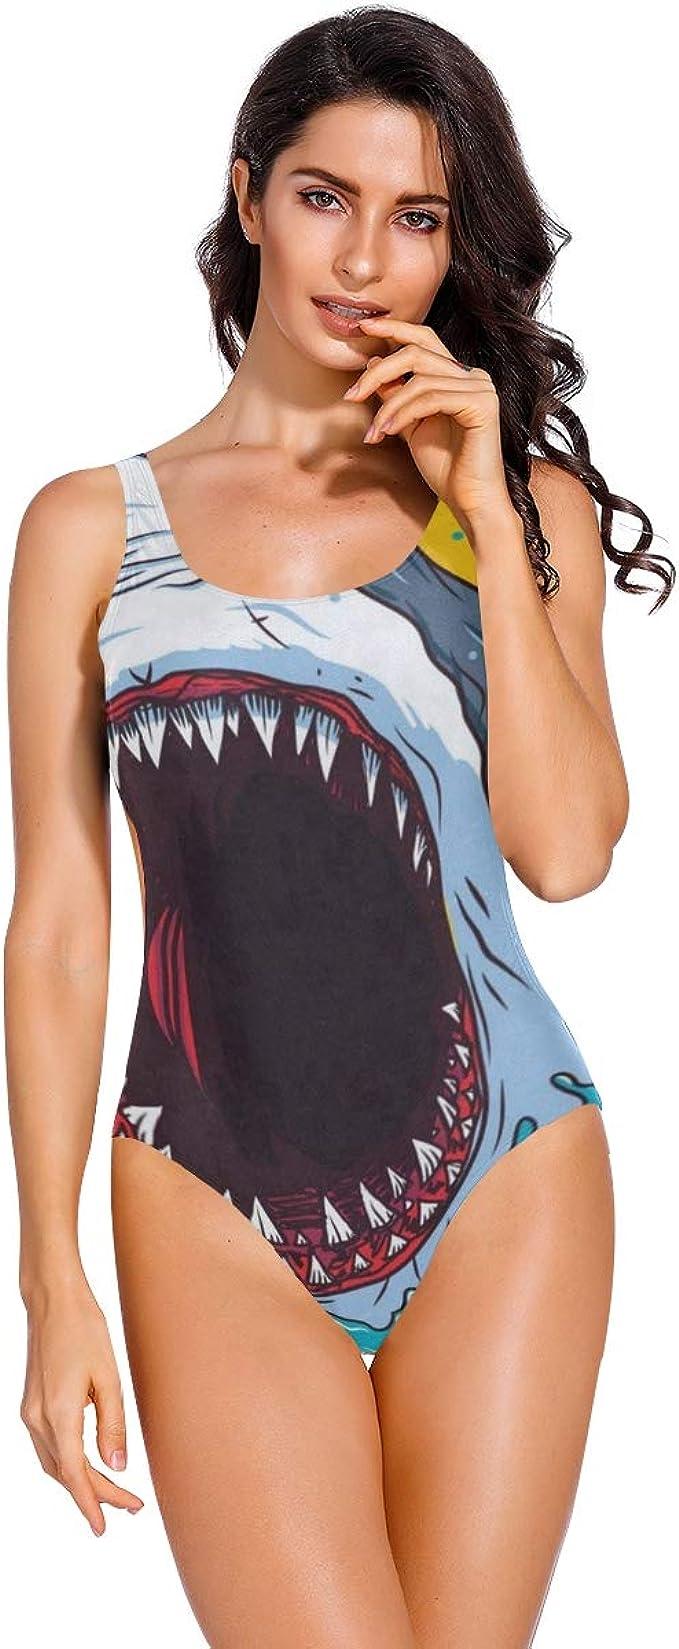 Womens  One-piece Swimwear Swimsuit Bodysuit Cartoon Gamers GAME THRONES